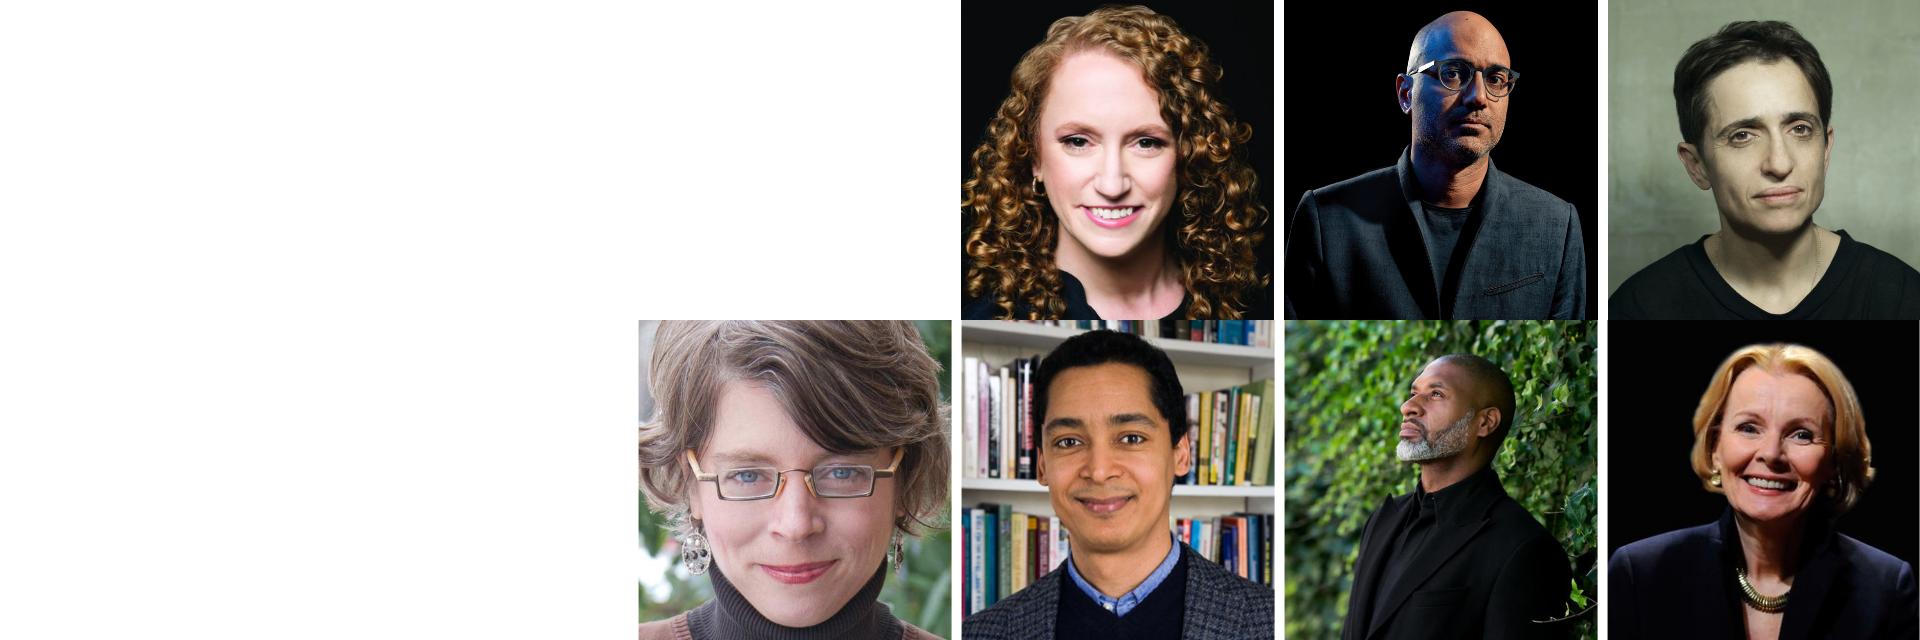 Headshots of Suzanne Nossel, Ayad Akhtar, Masha Gessen, Jill Lepore, Omar G. Encarnación, Charles Blow, and Peggy Noonan